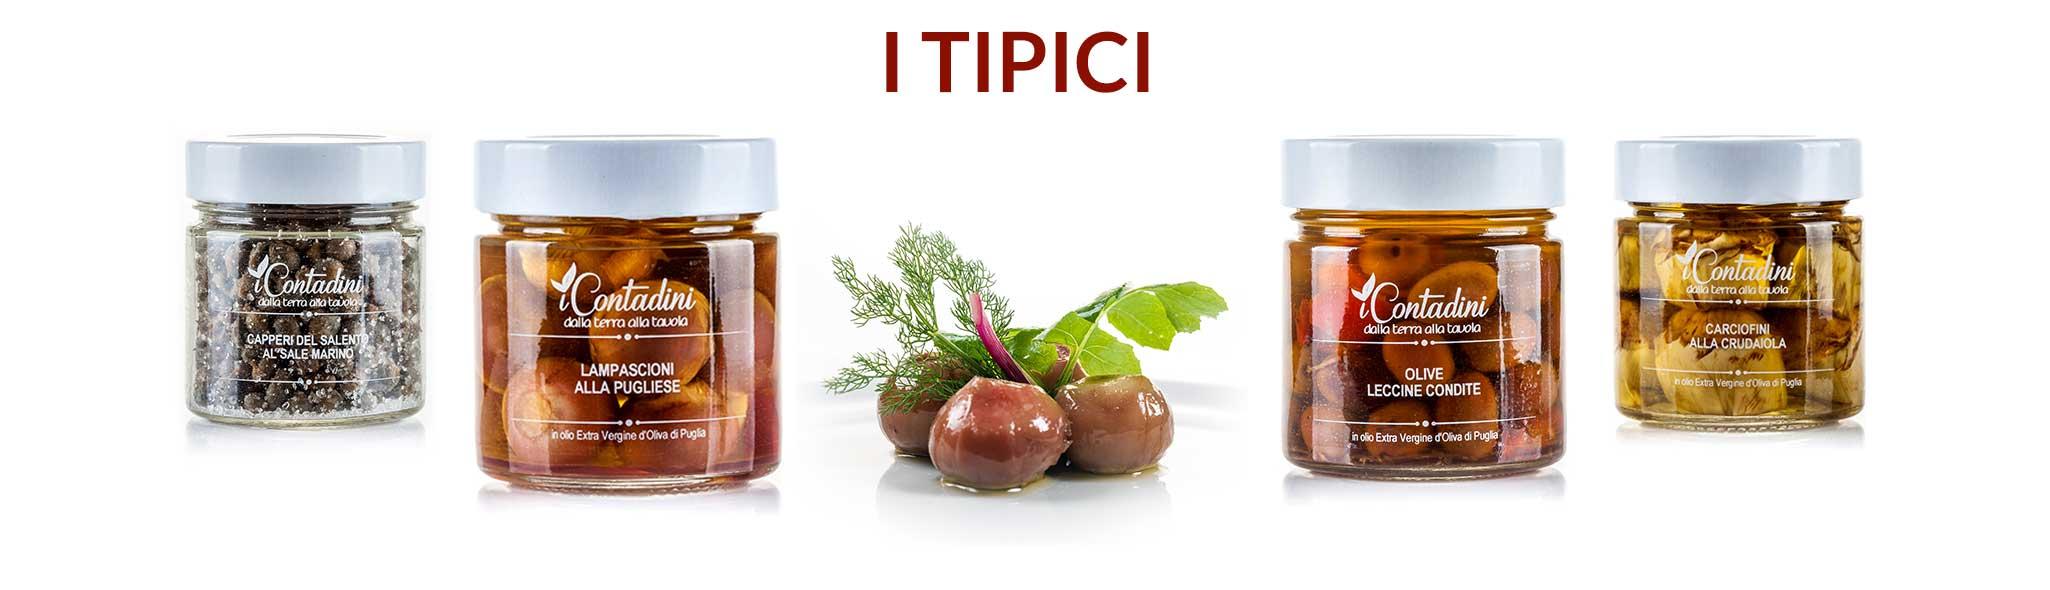 itipici